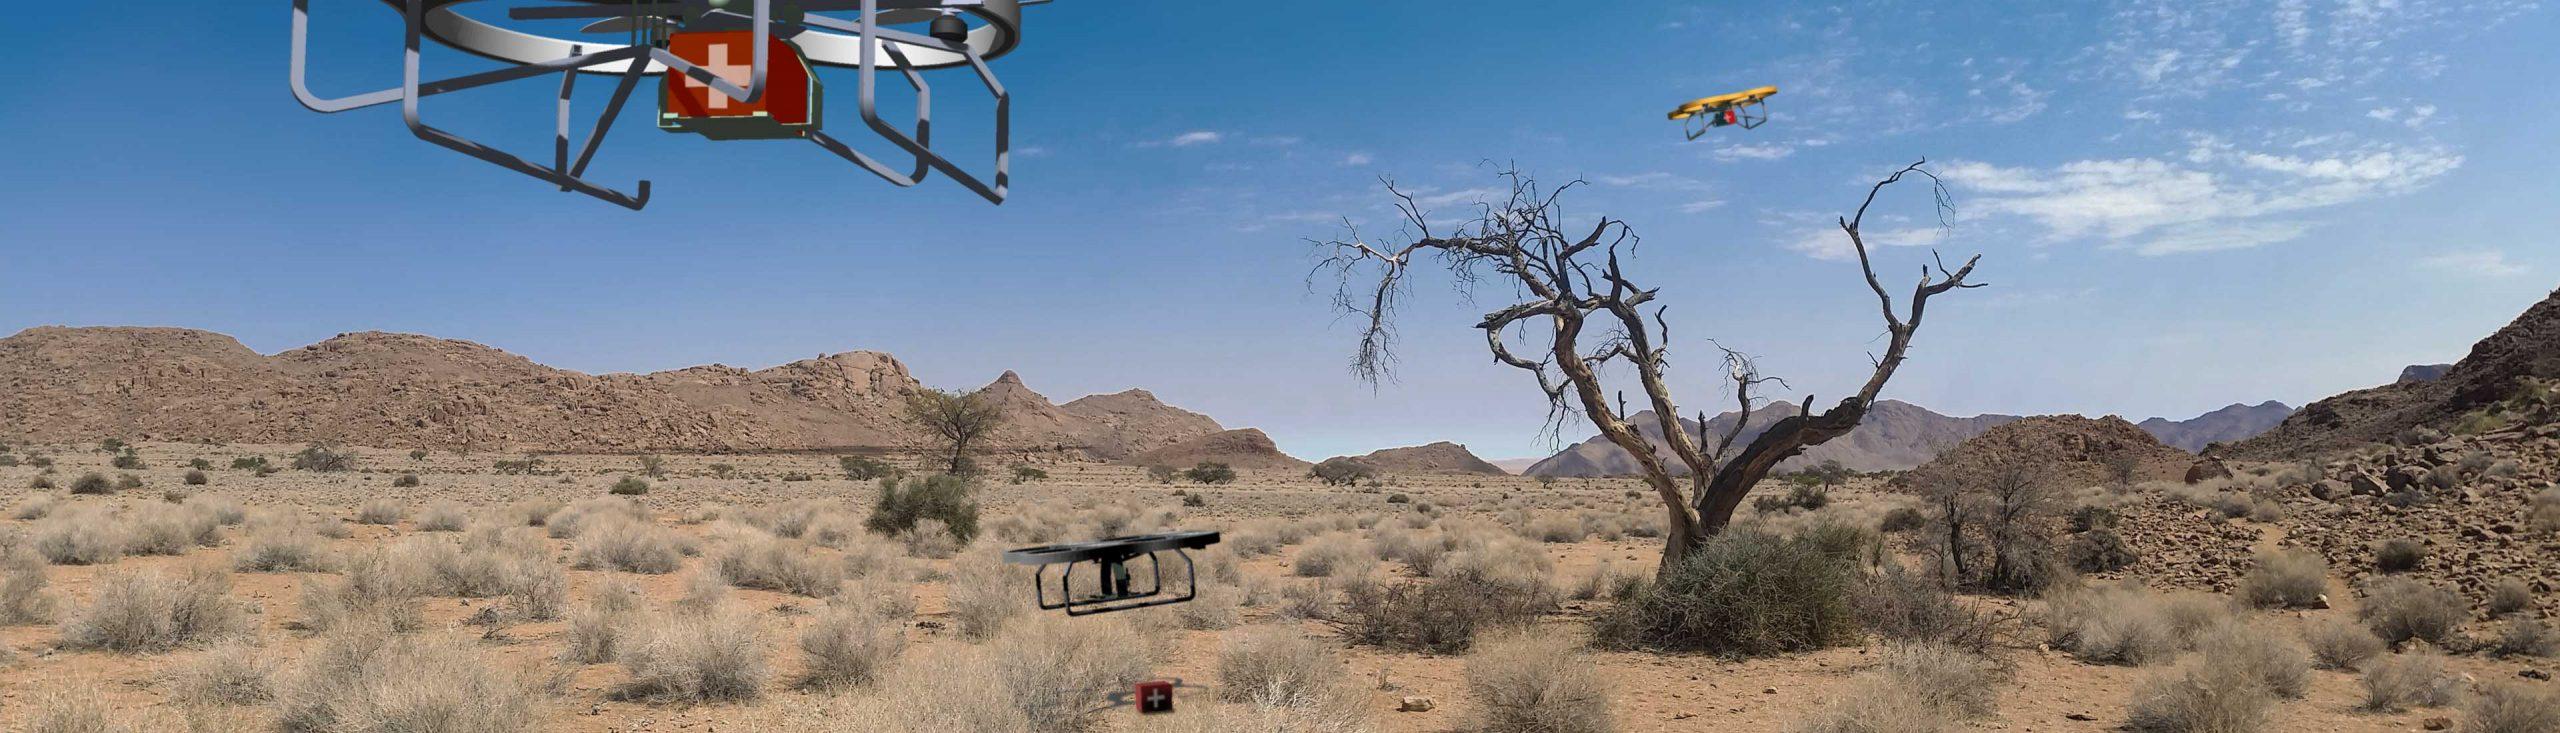 MediDrones-in-the-desert-redWhite